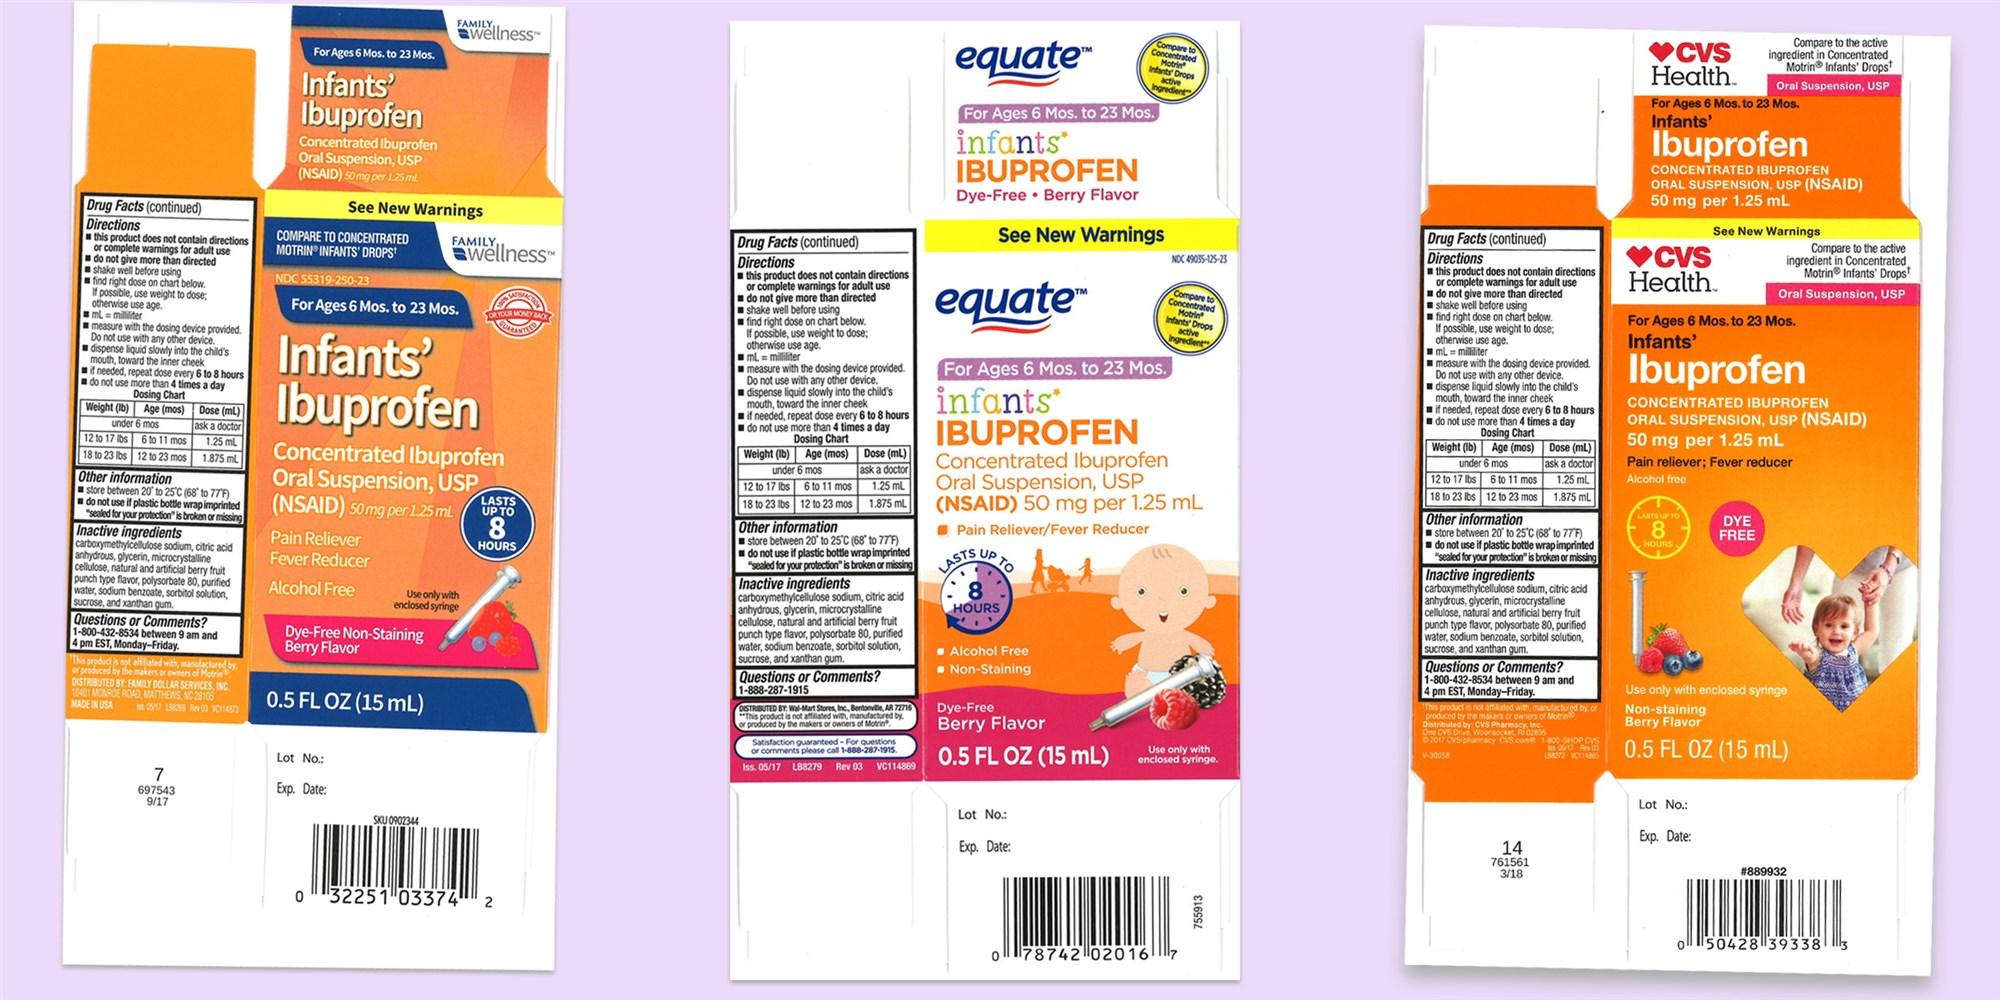 ibuprofen-recall-today-main-181206_02c86ae00ea6be6386fa2b1083222cbd.fit-2000w_1544126115987-22991016.jpg